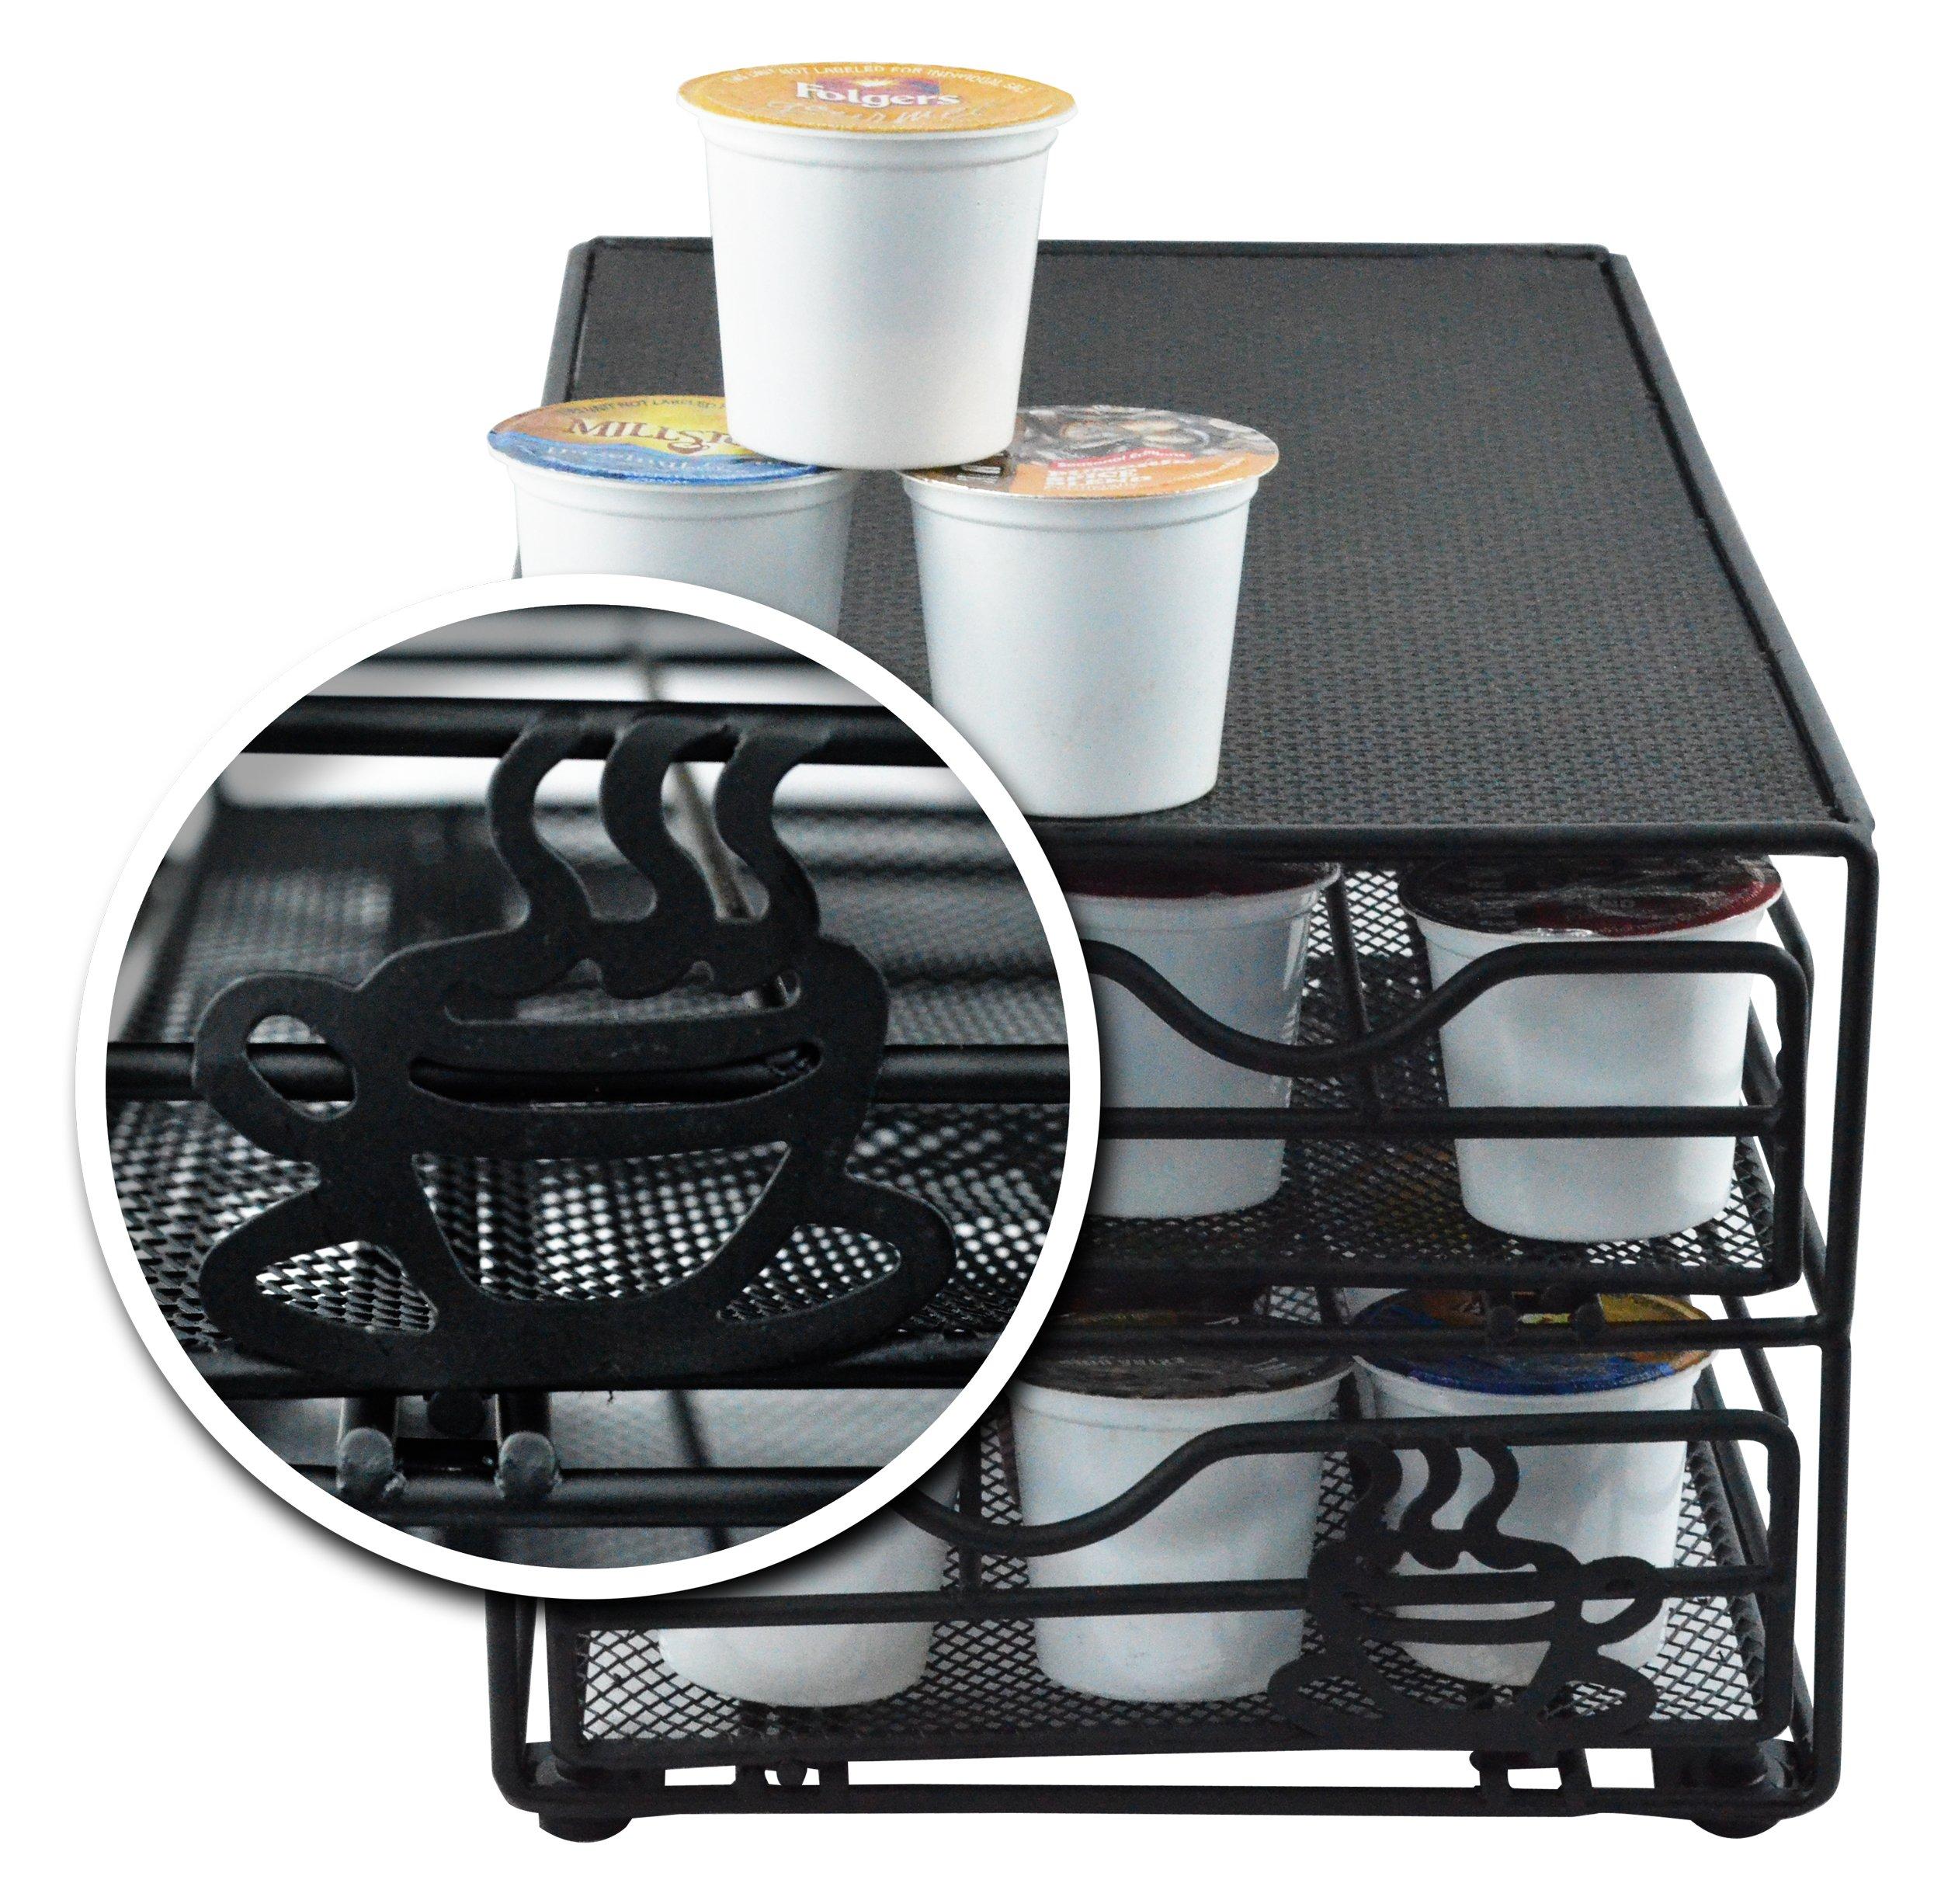 Southern Homewares 36 Pod 2-Tier Storage Drawer Fits Keurig K-Cups.